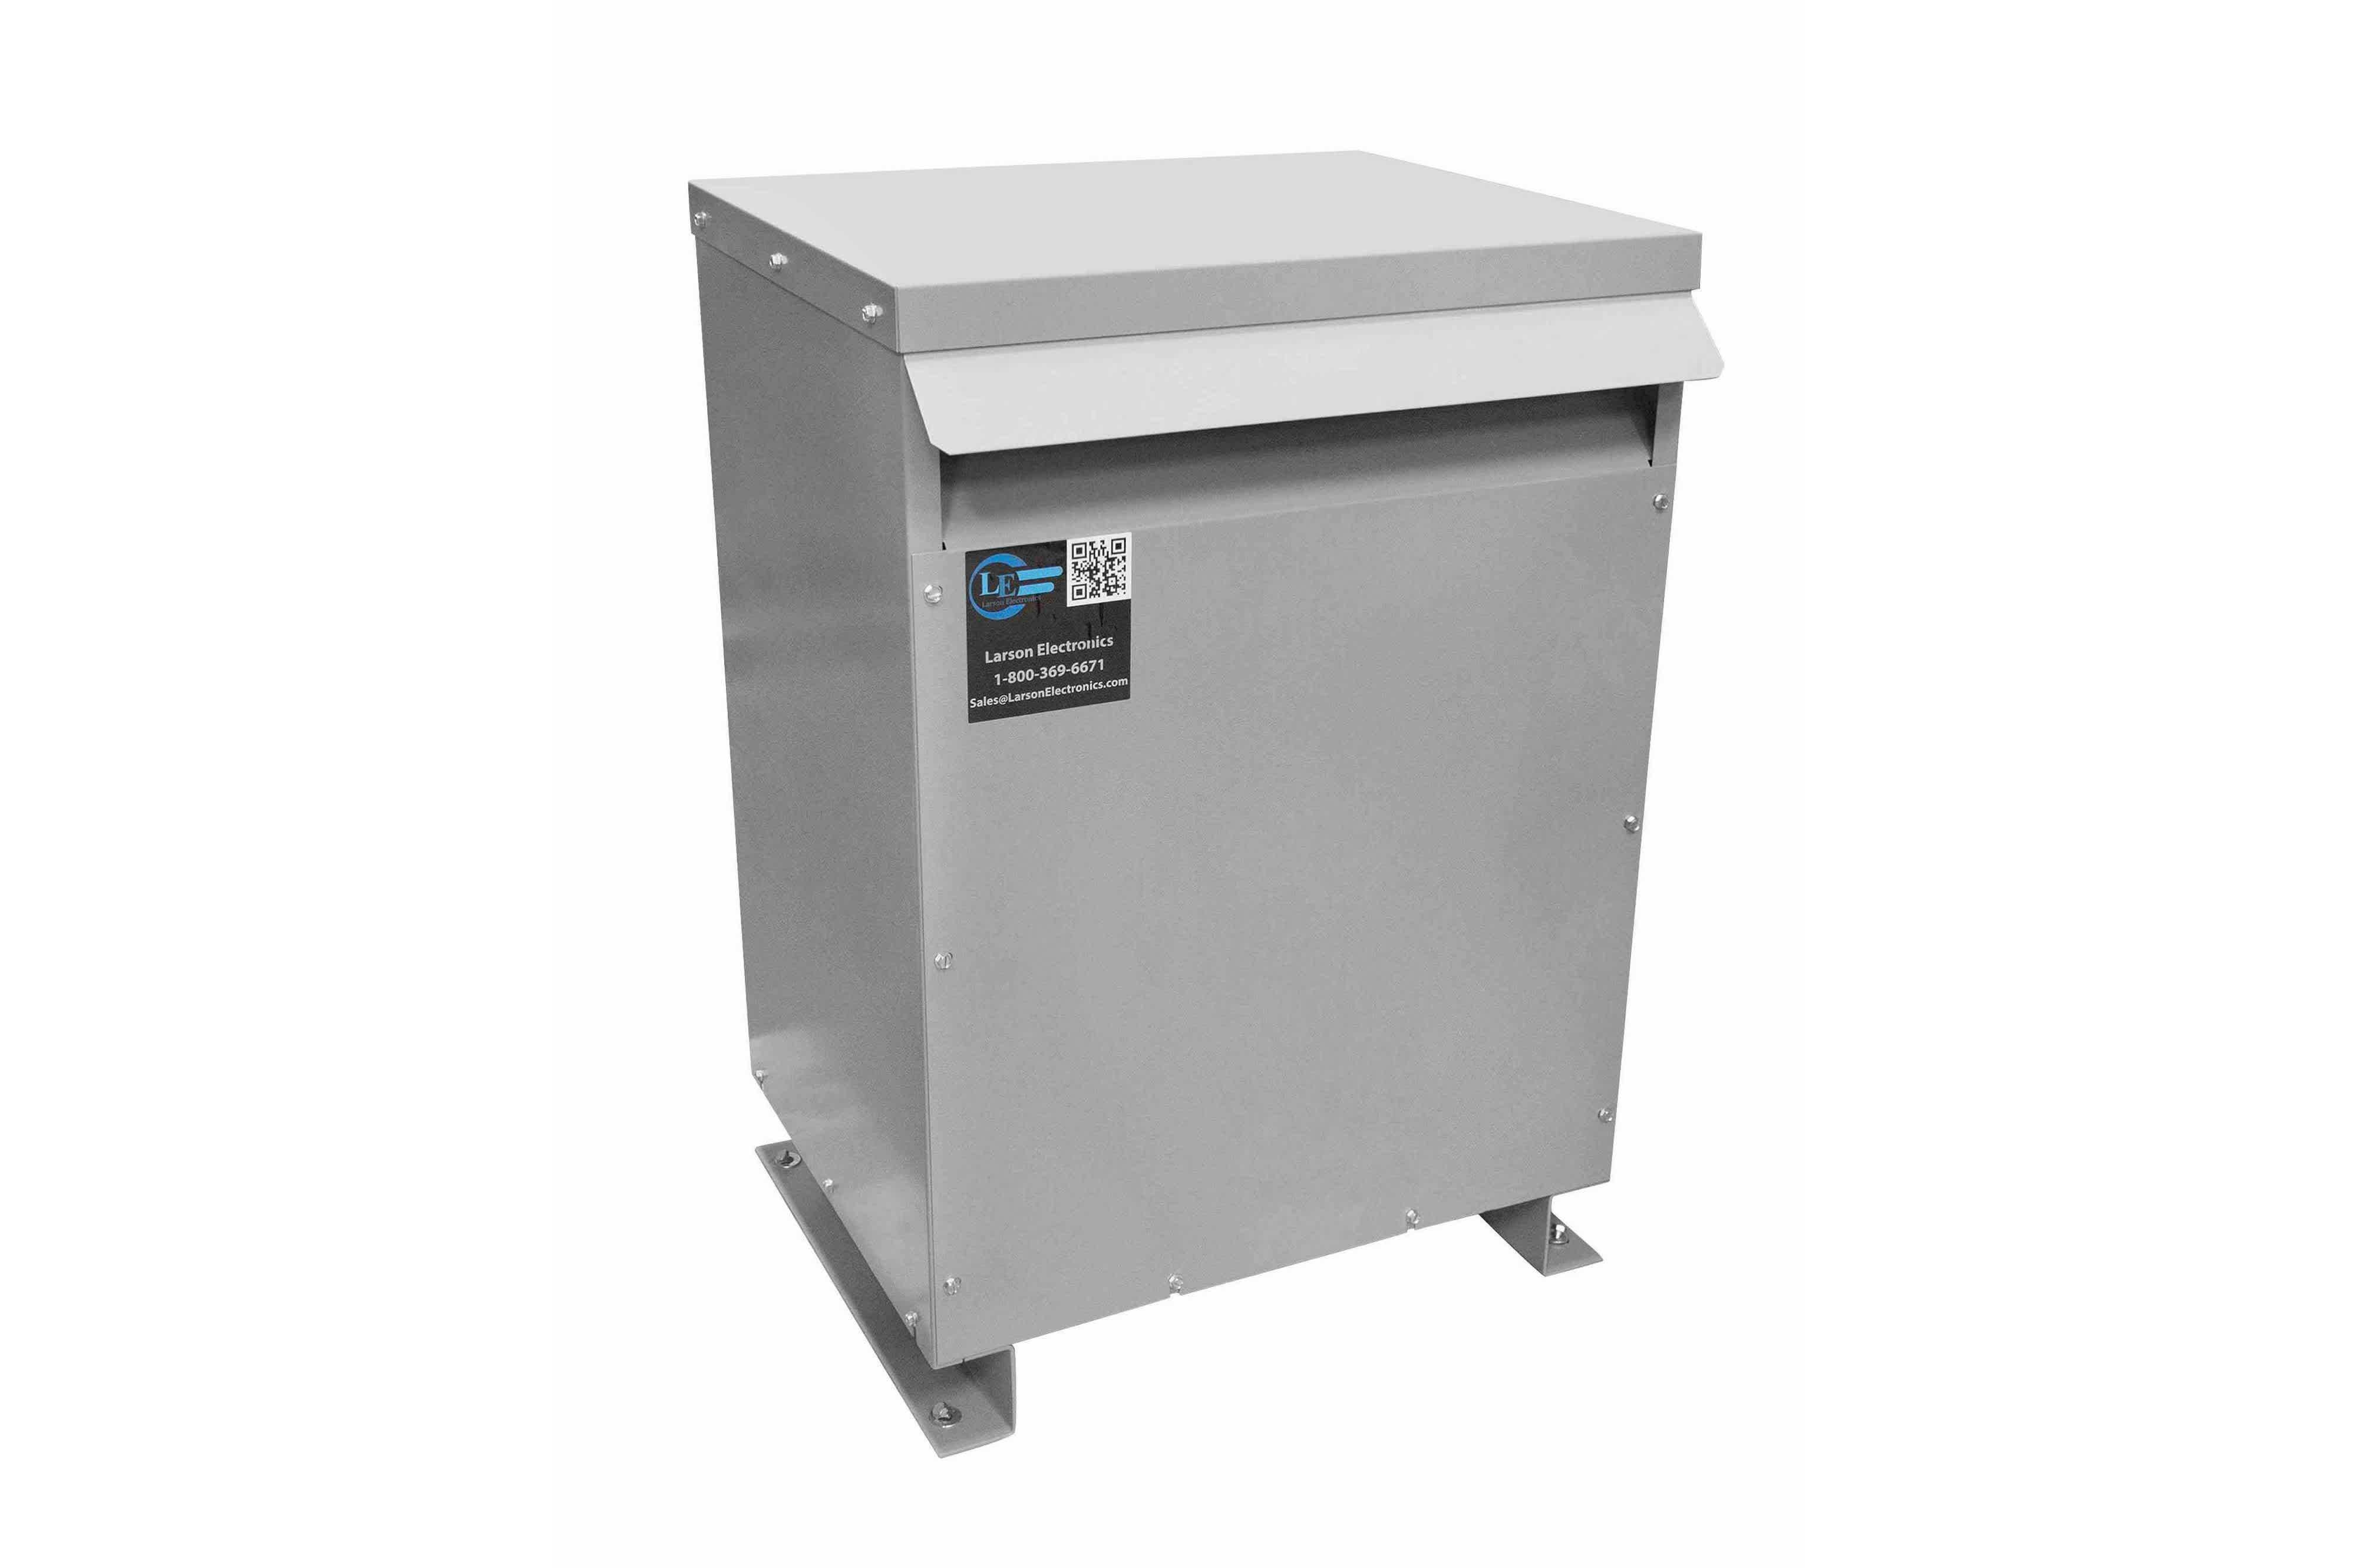 36 kVA 3PH Isolation Transformer, 600V Wye Primary, 460Y/266 Wye-N Secondary, N3R, Ventilated, 60 Hz